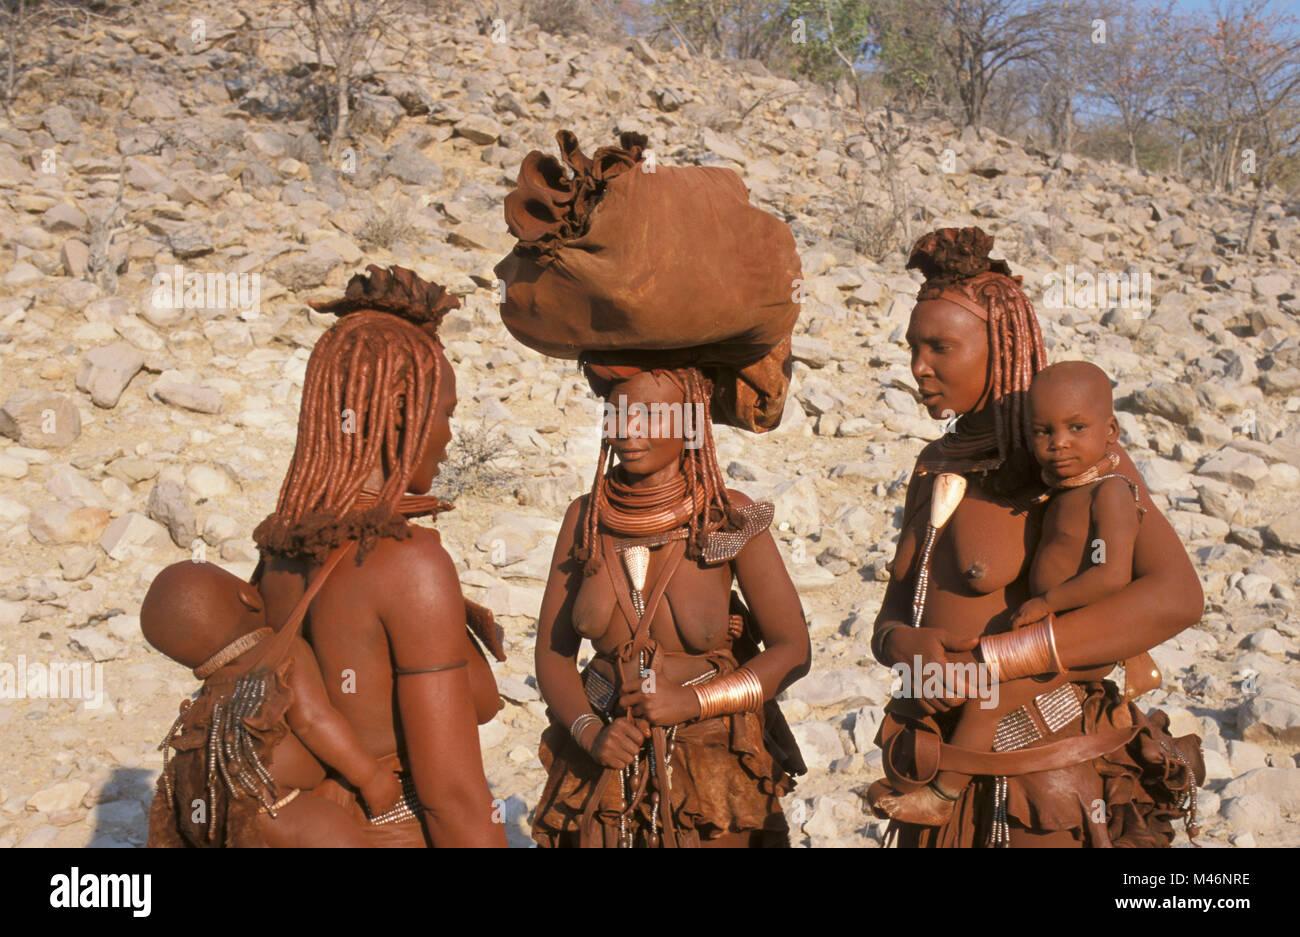 Namibia. Kaokoveld, near Opuwo. Himba tribe. Women, mothers and baby. - Stock Image